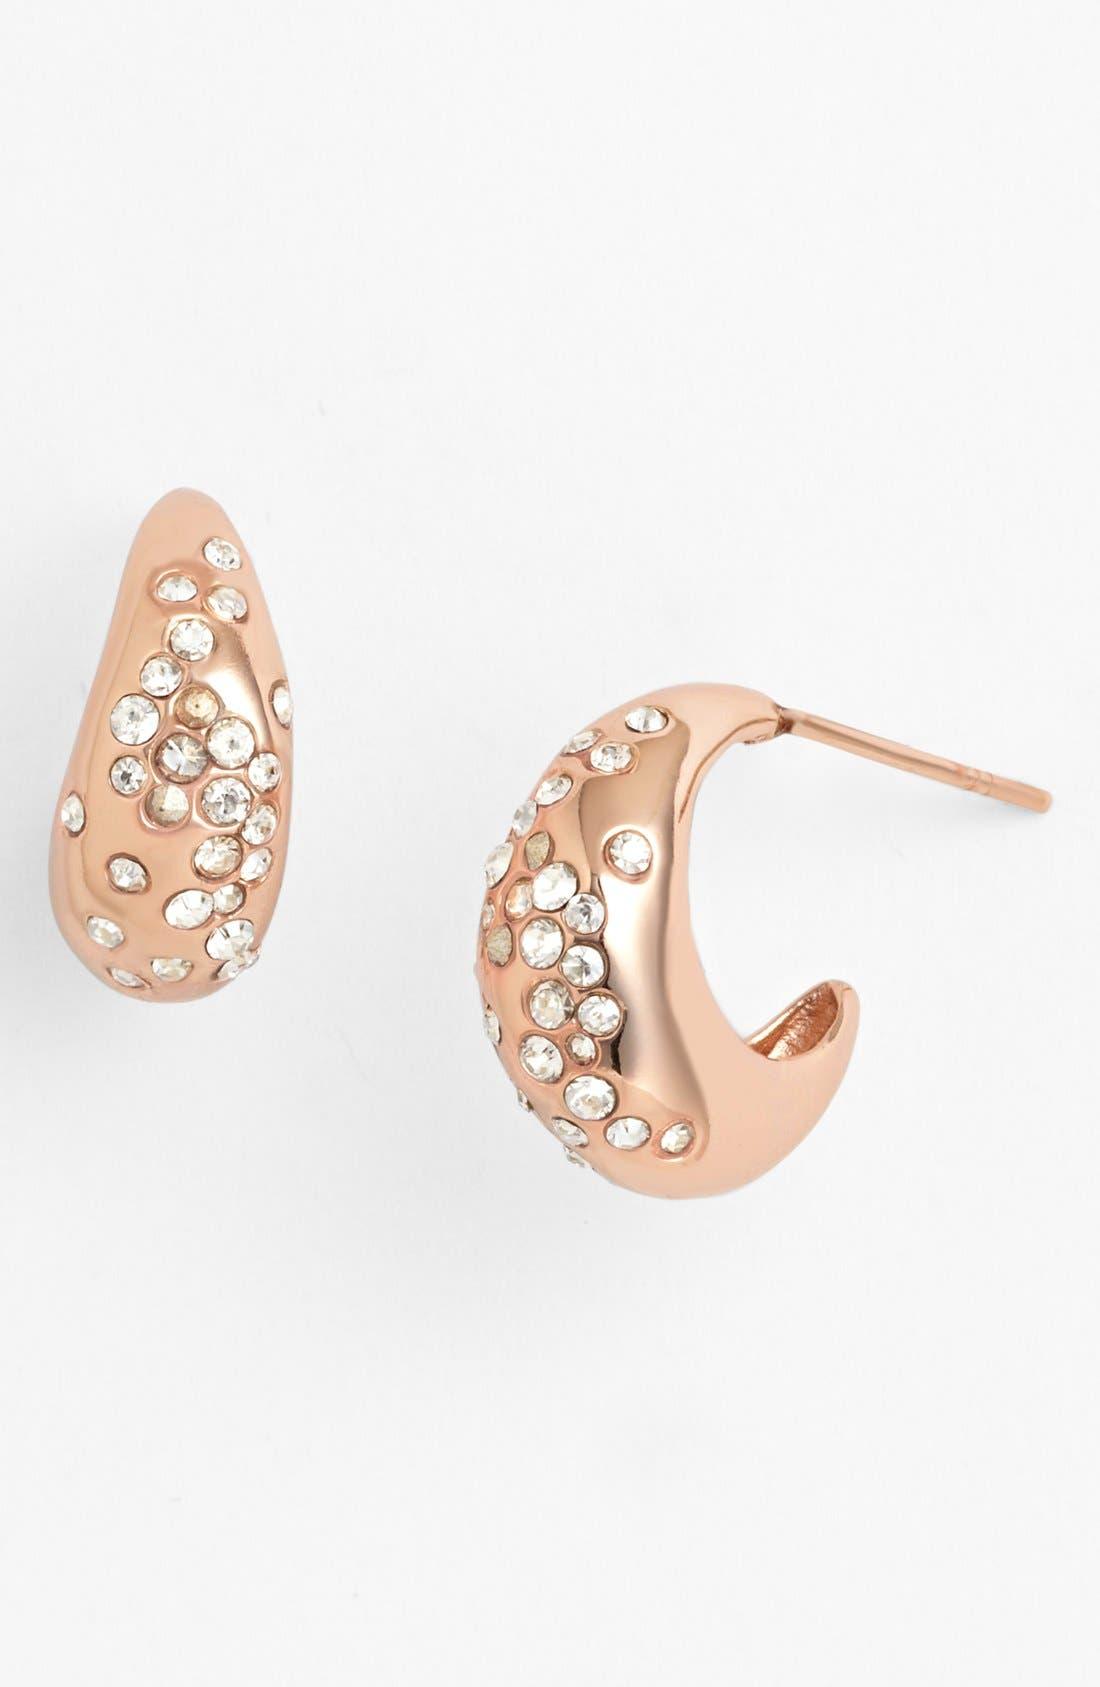 Alternate Image 1 Selected - Alexis Bittar 'Miss Havisham' Small Hoop Earrings